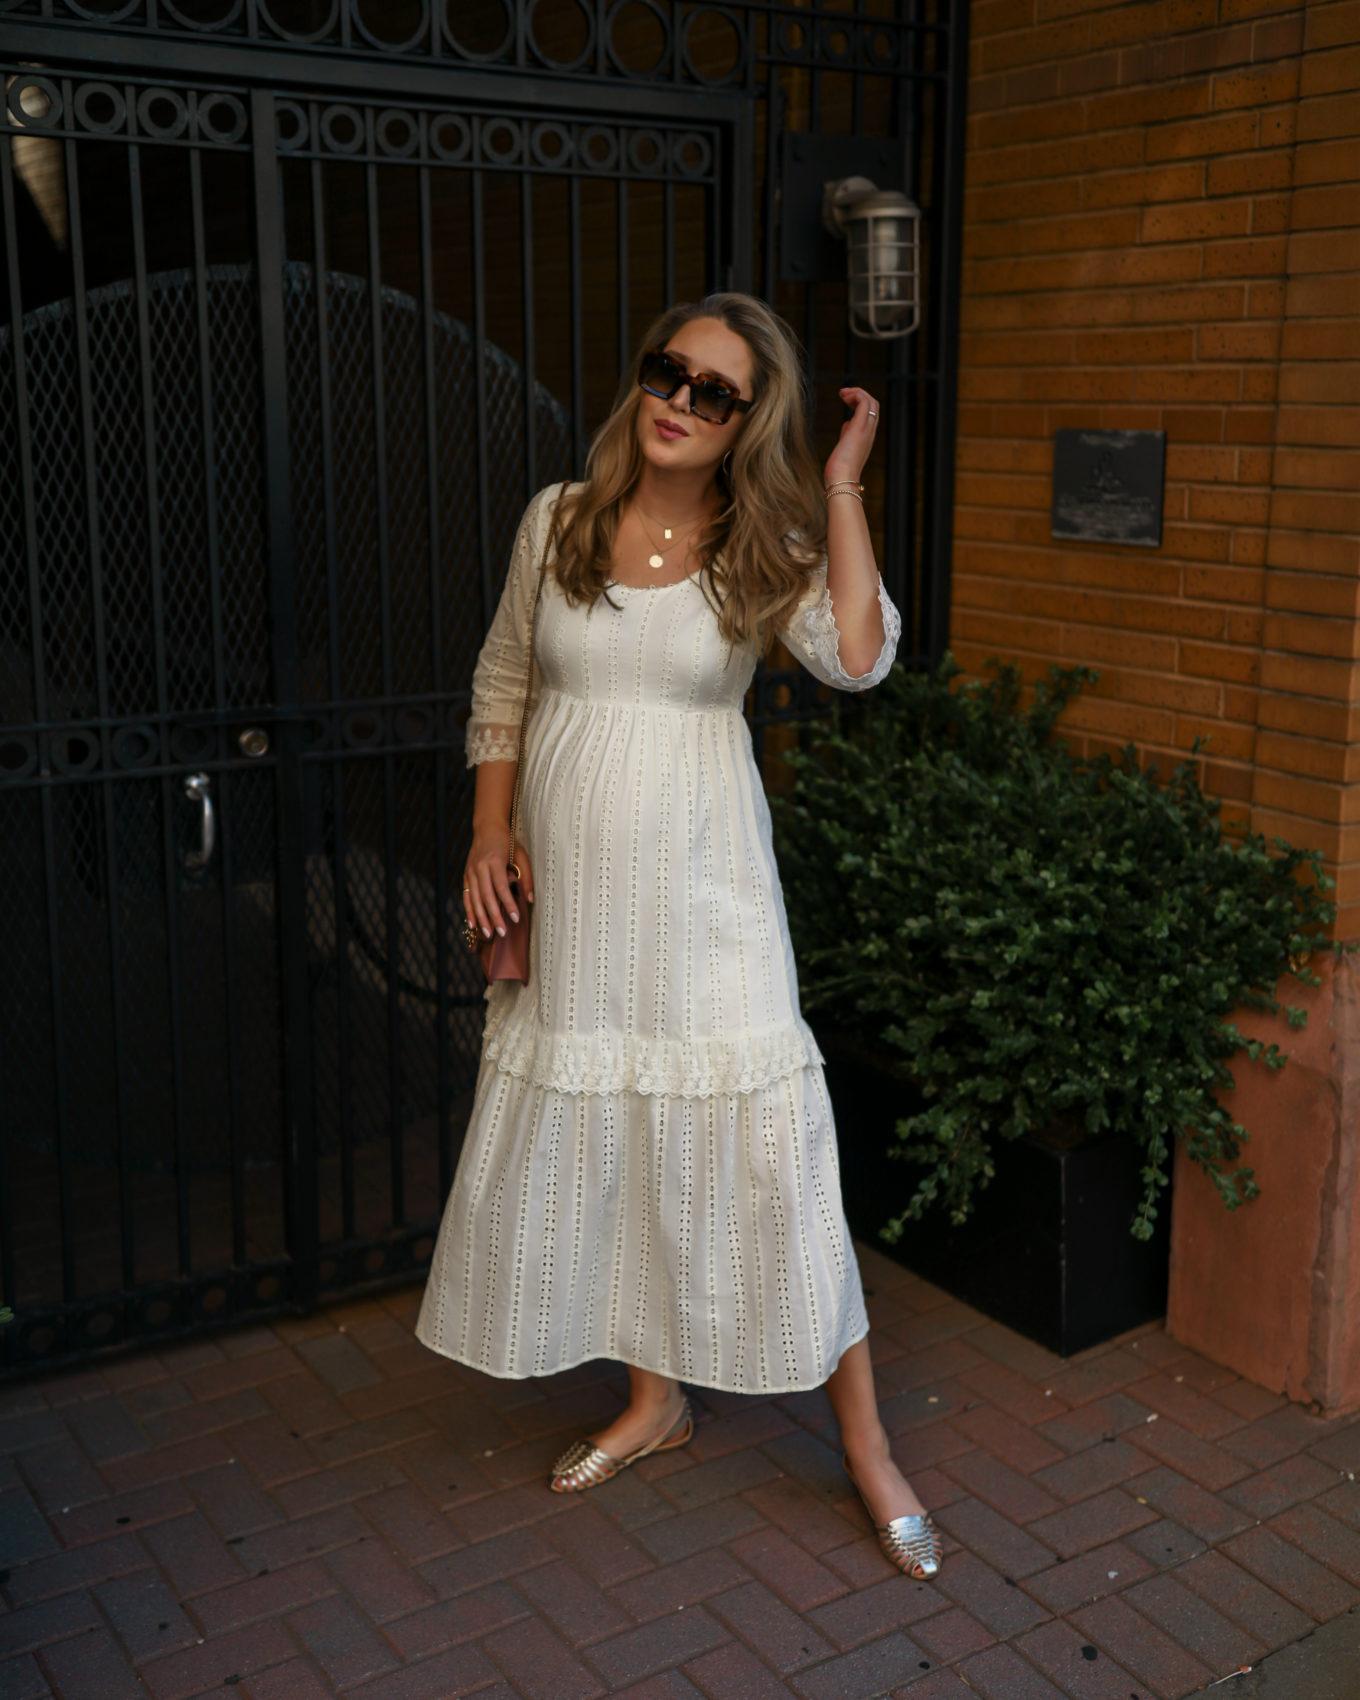 How To Shop Non Maternity Clothes While Pregnant Memorandum